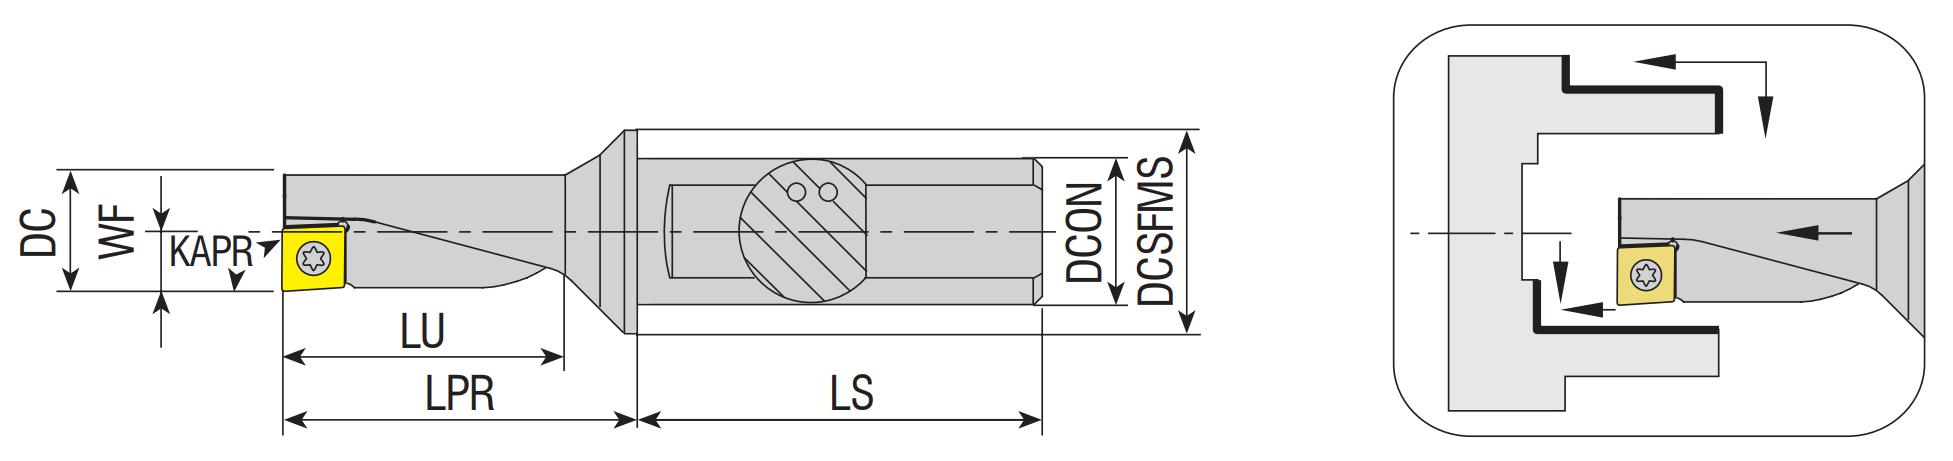 Multifunktionales Dreh- und Bohrwerkzeug AEKR/L